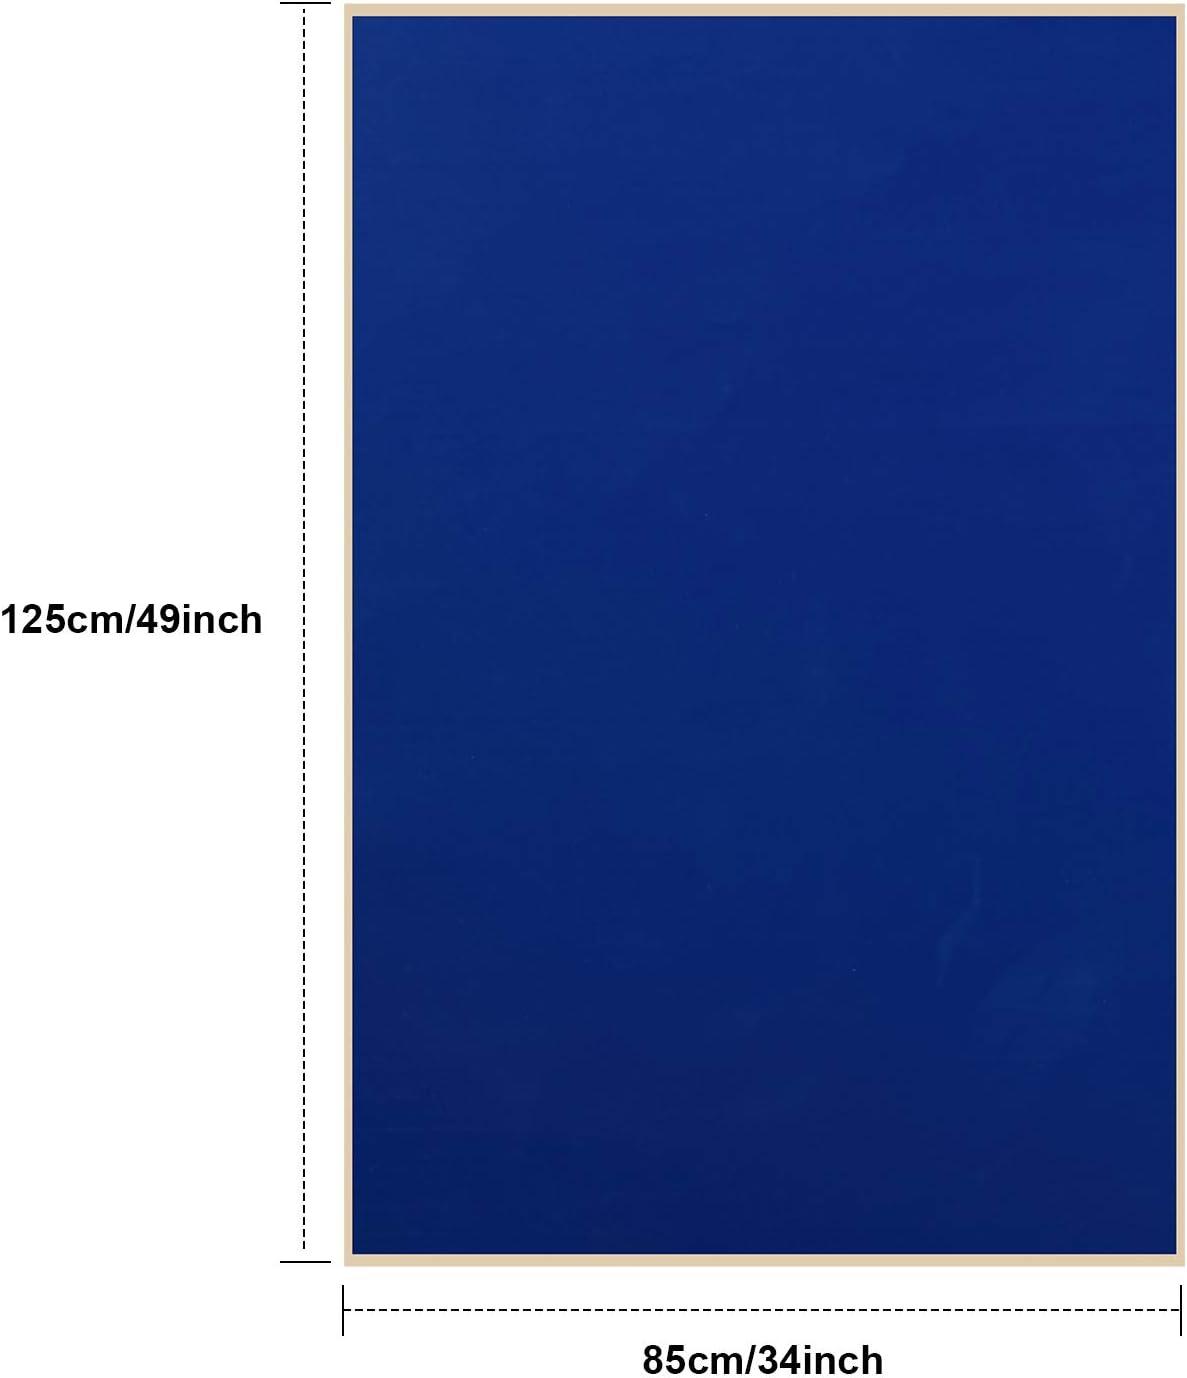 Syhood Parches de Reparaci/ón de Forro de Piscina de Vinilo de 49 x 34 Pulgadas para Reparaci/ón de Piscinas de Vinilo Azul